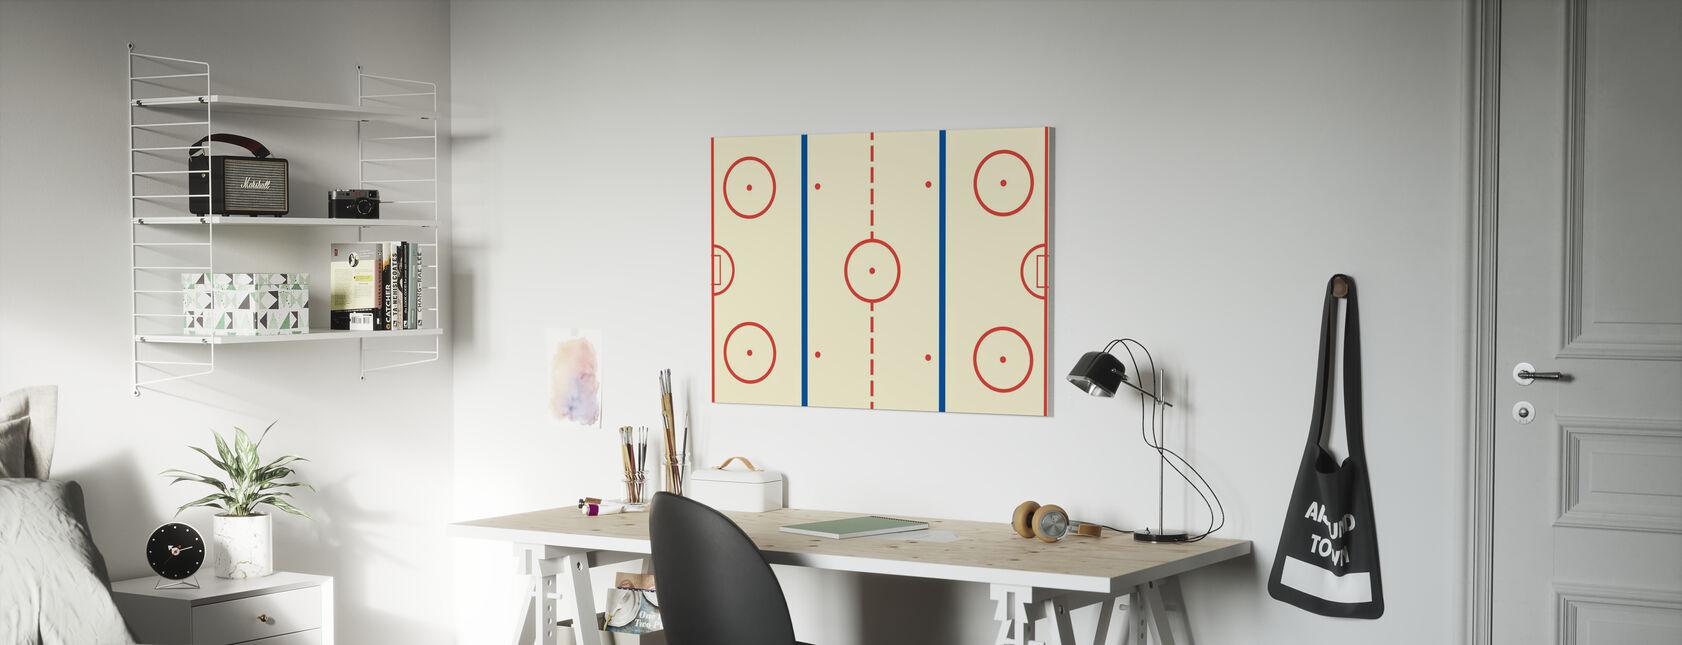 Pista Hockey - Stampa su tela - Camera dei bambini